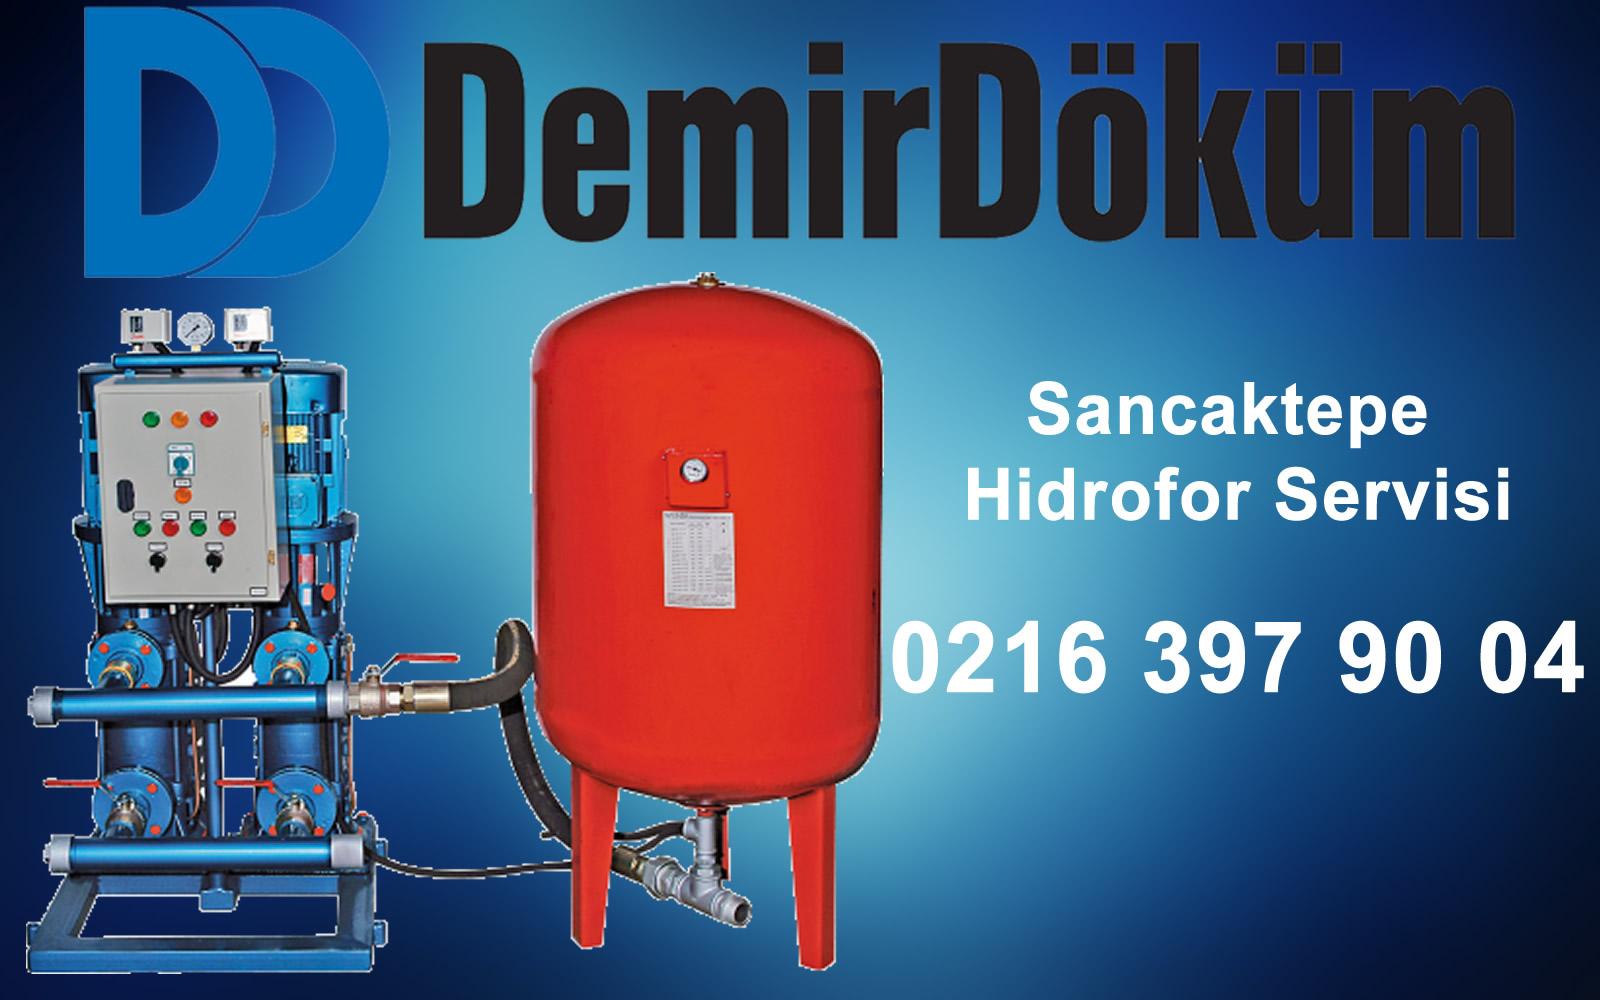 Sancaktepe Demirdöküm Hidrofor Servisi